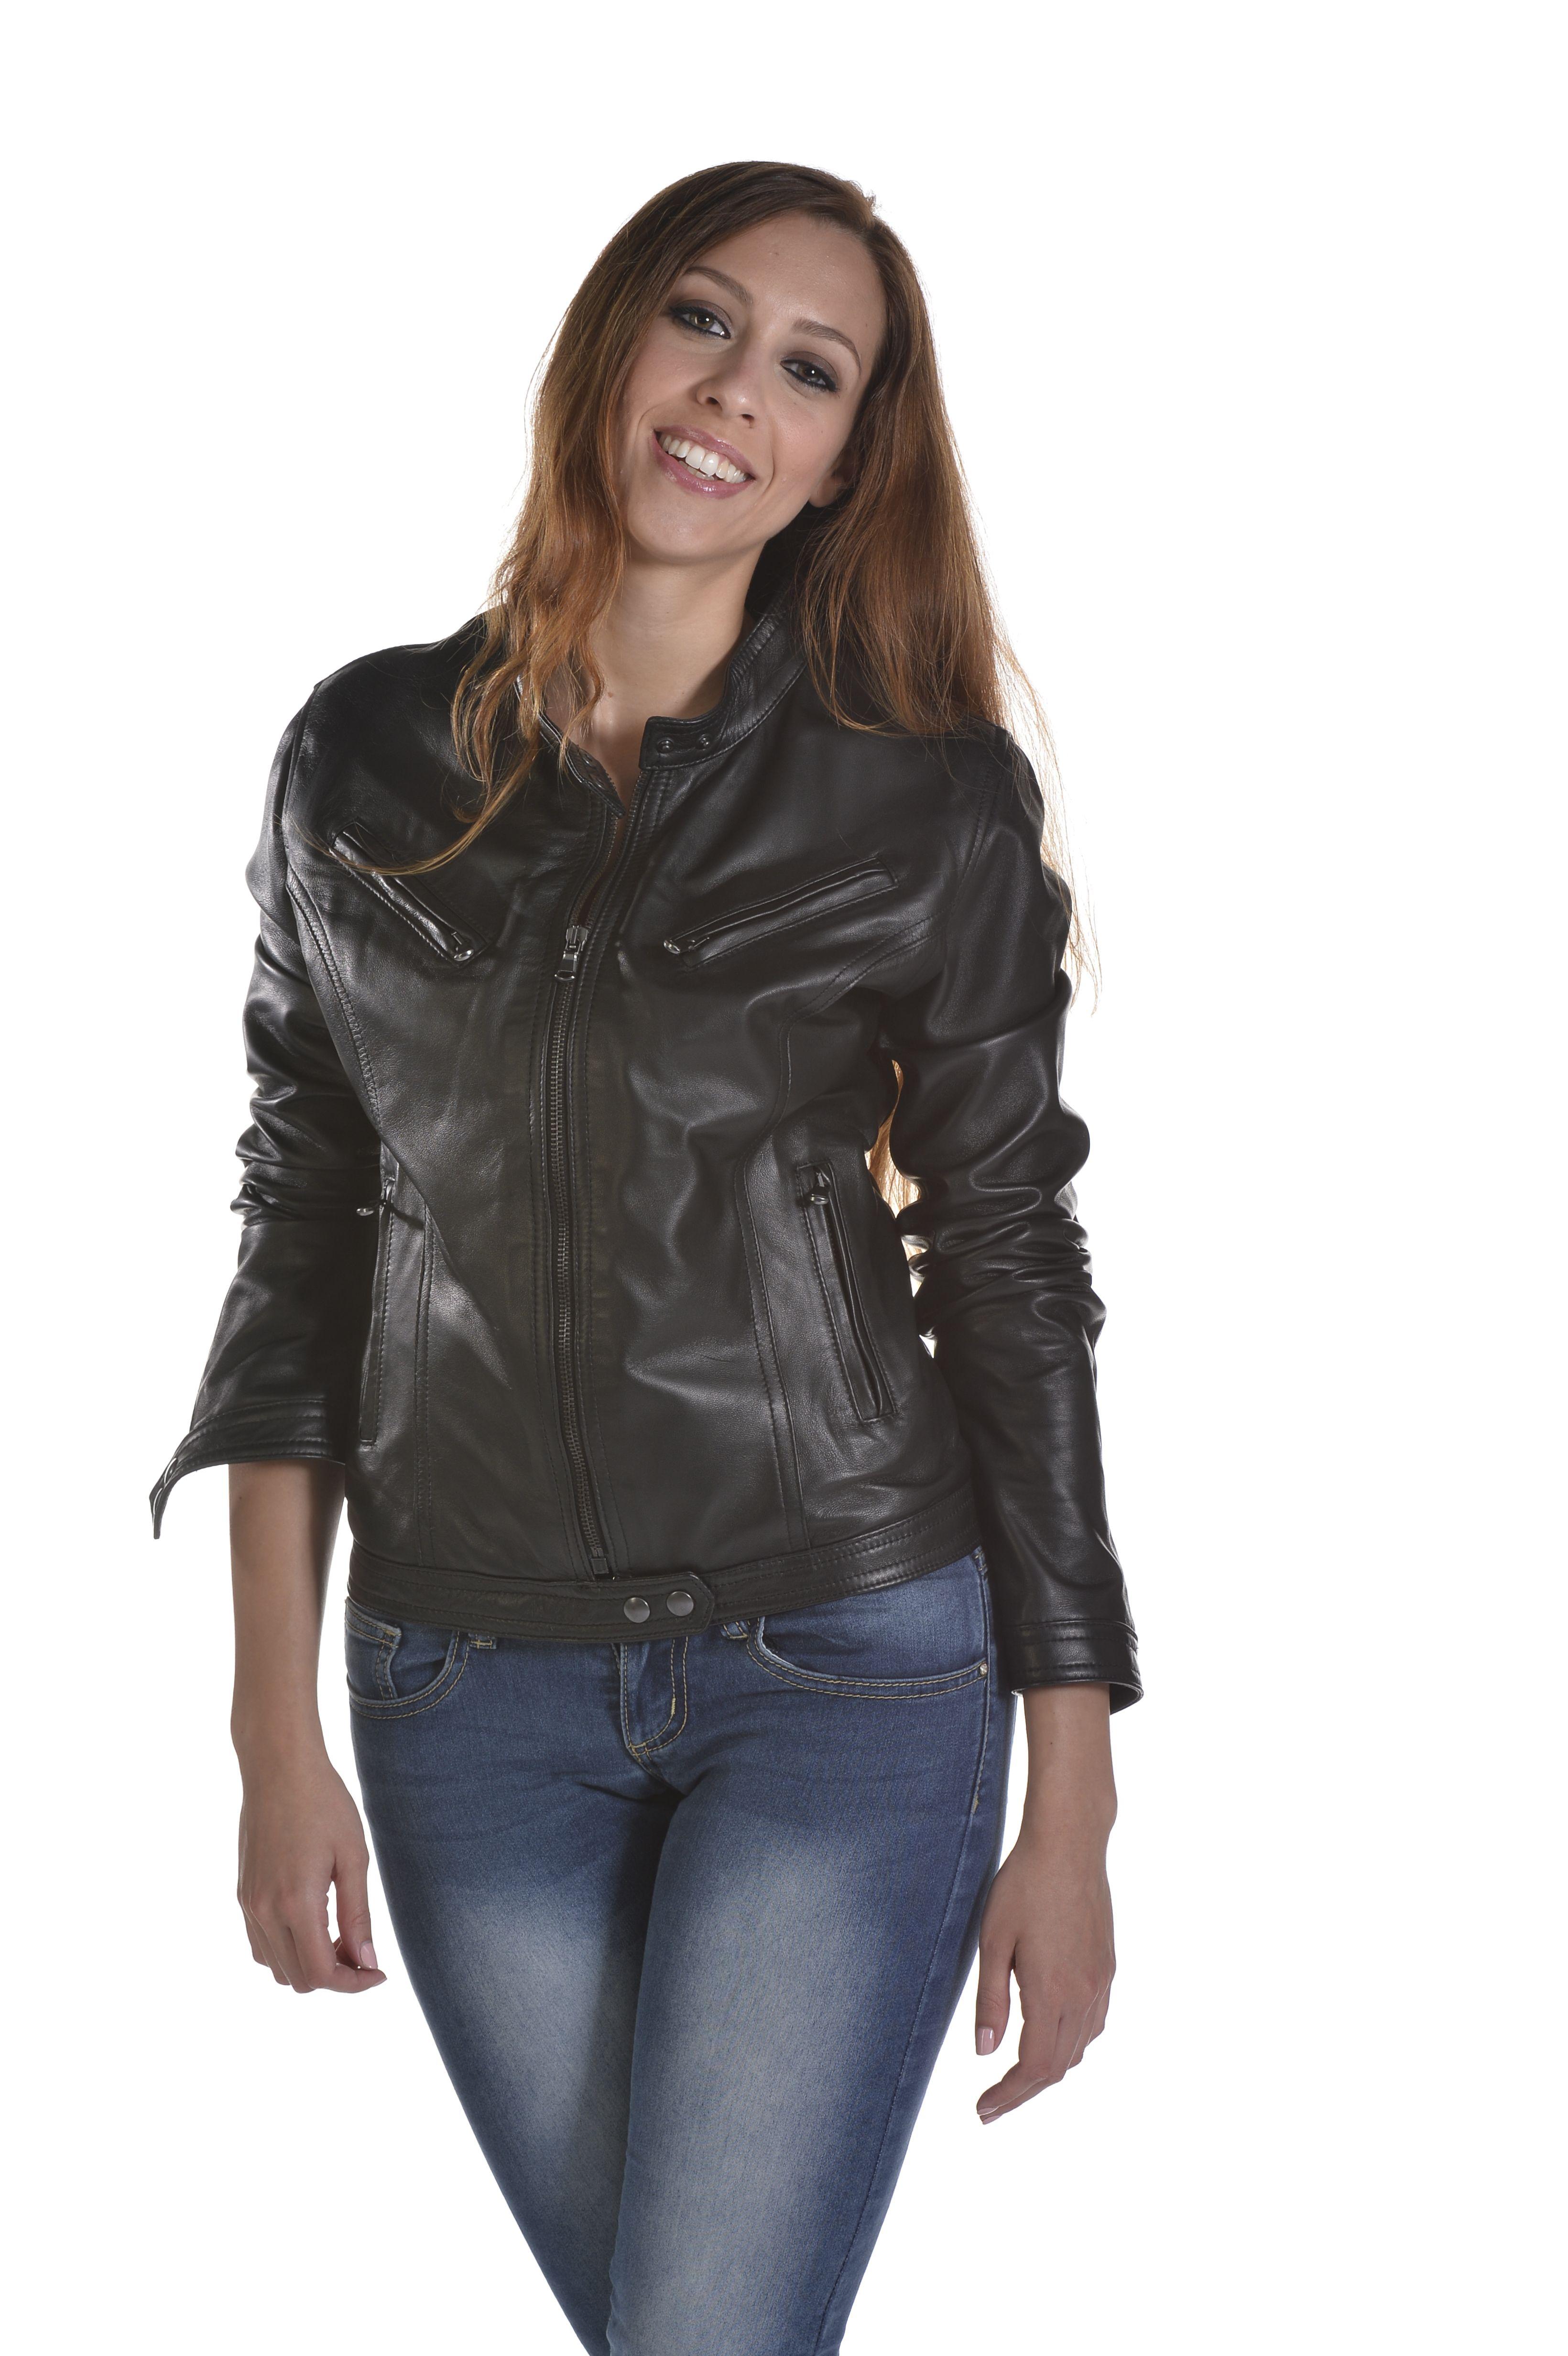 Leather jackert art Luisa giubbino in pelle colore nero